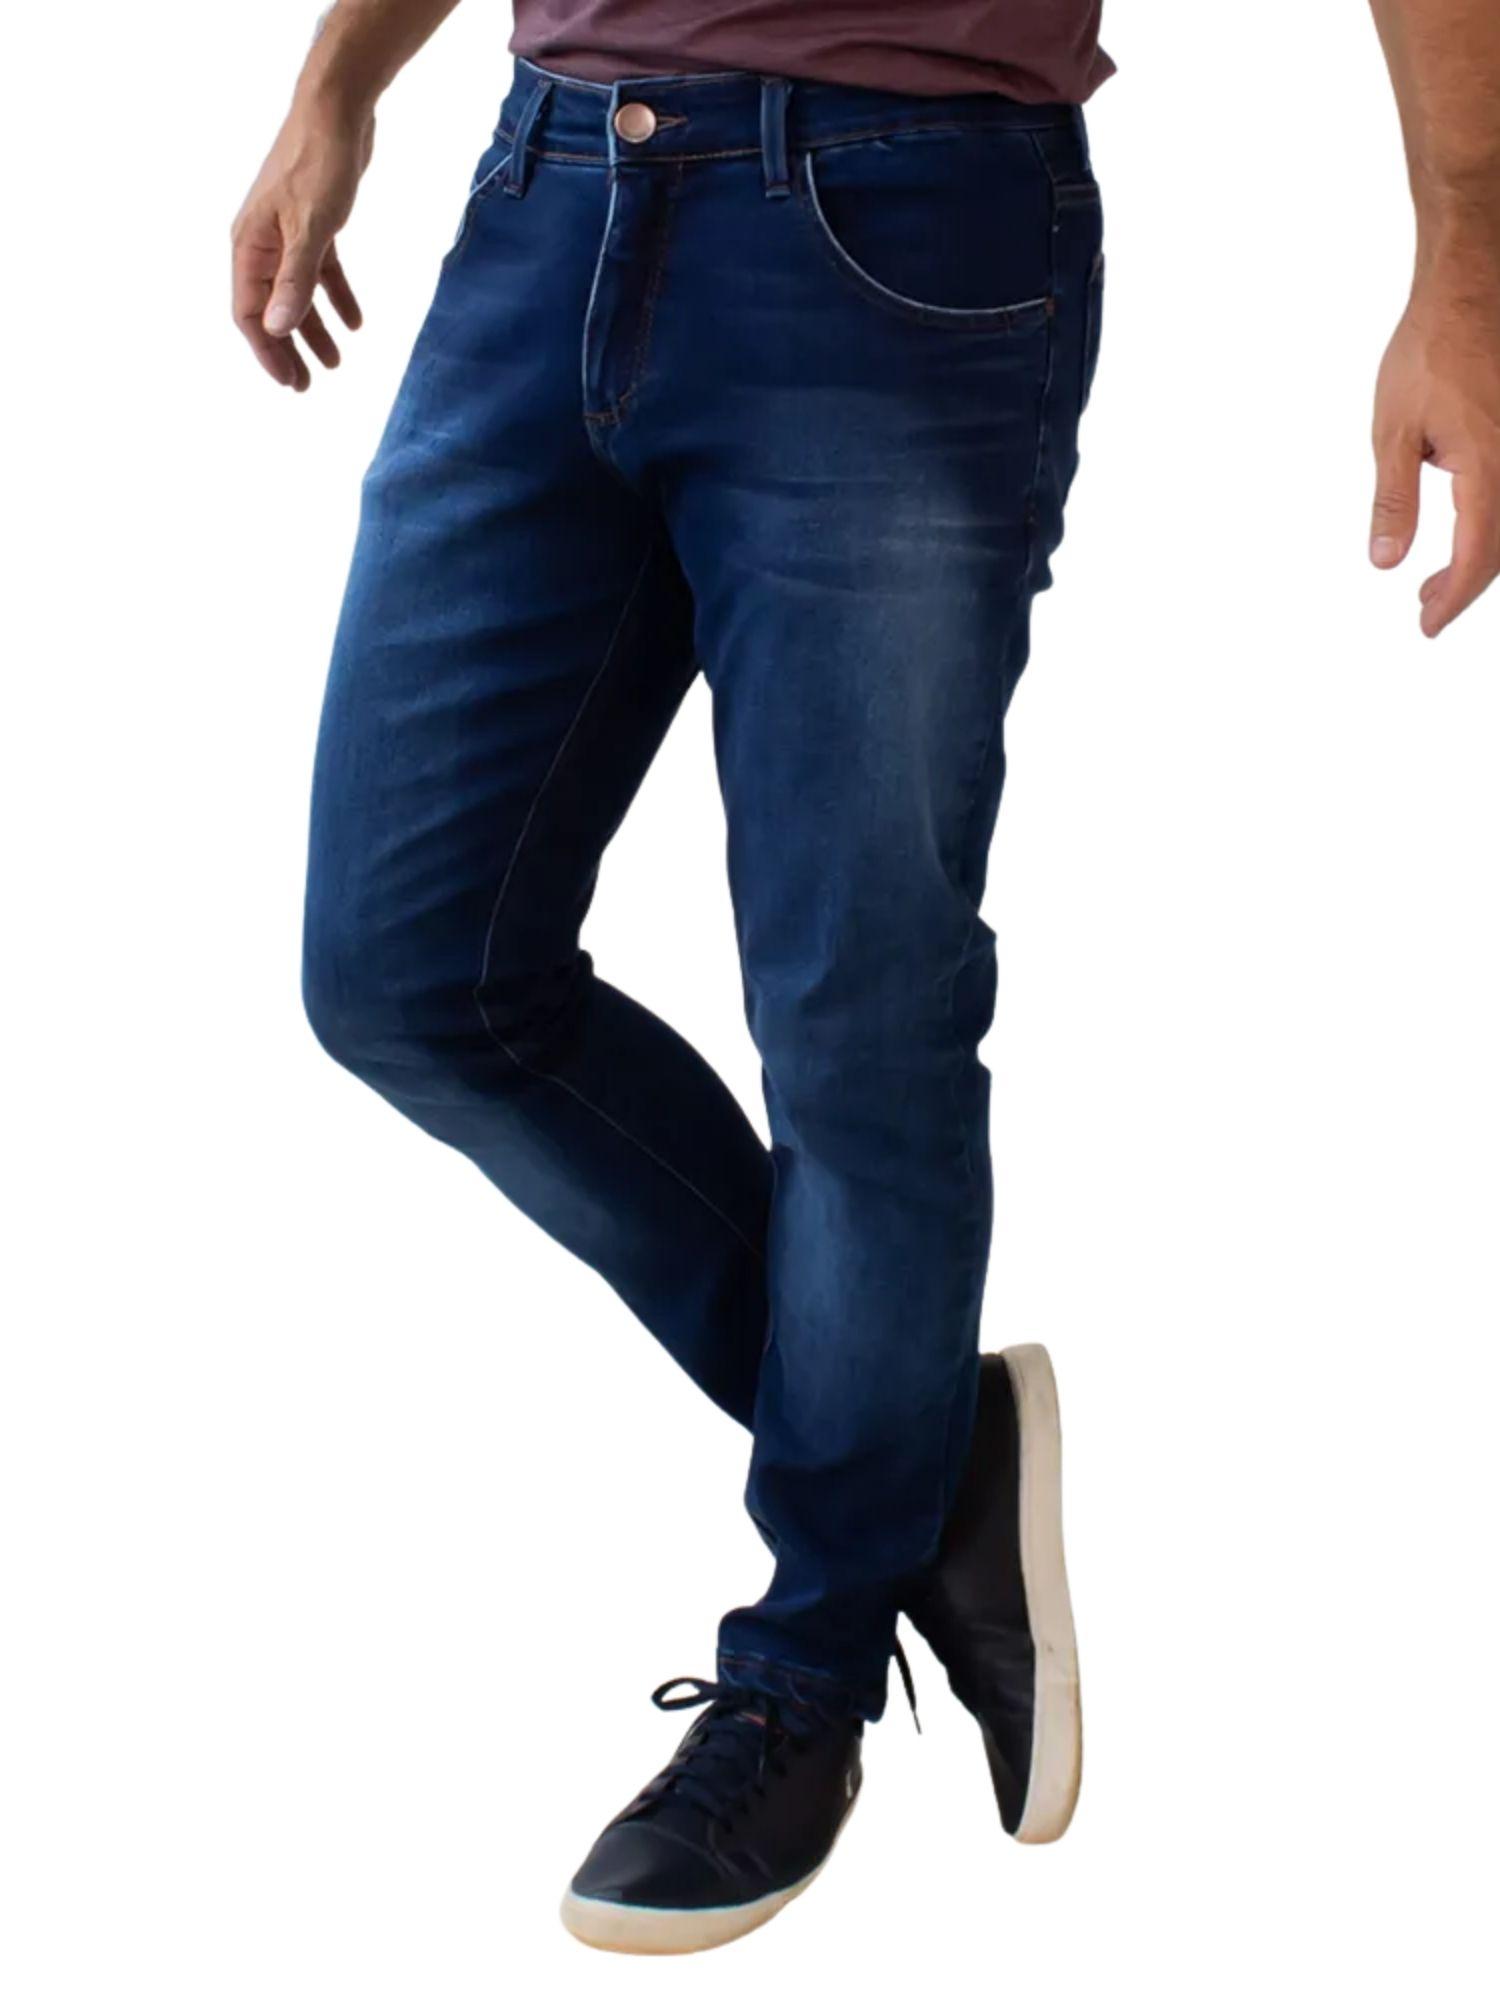 Calça Masculina Super Skinny Anticorpus  22417